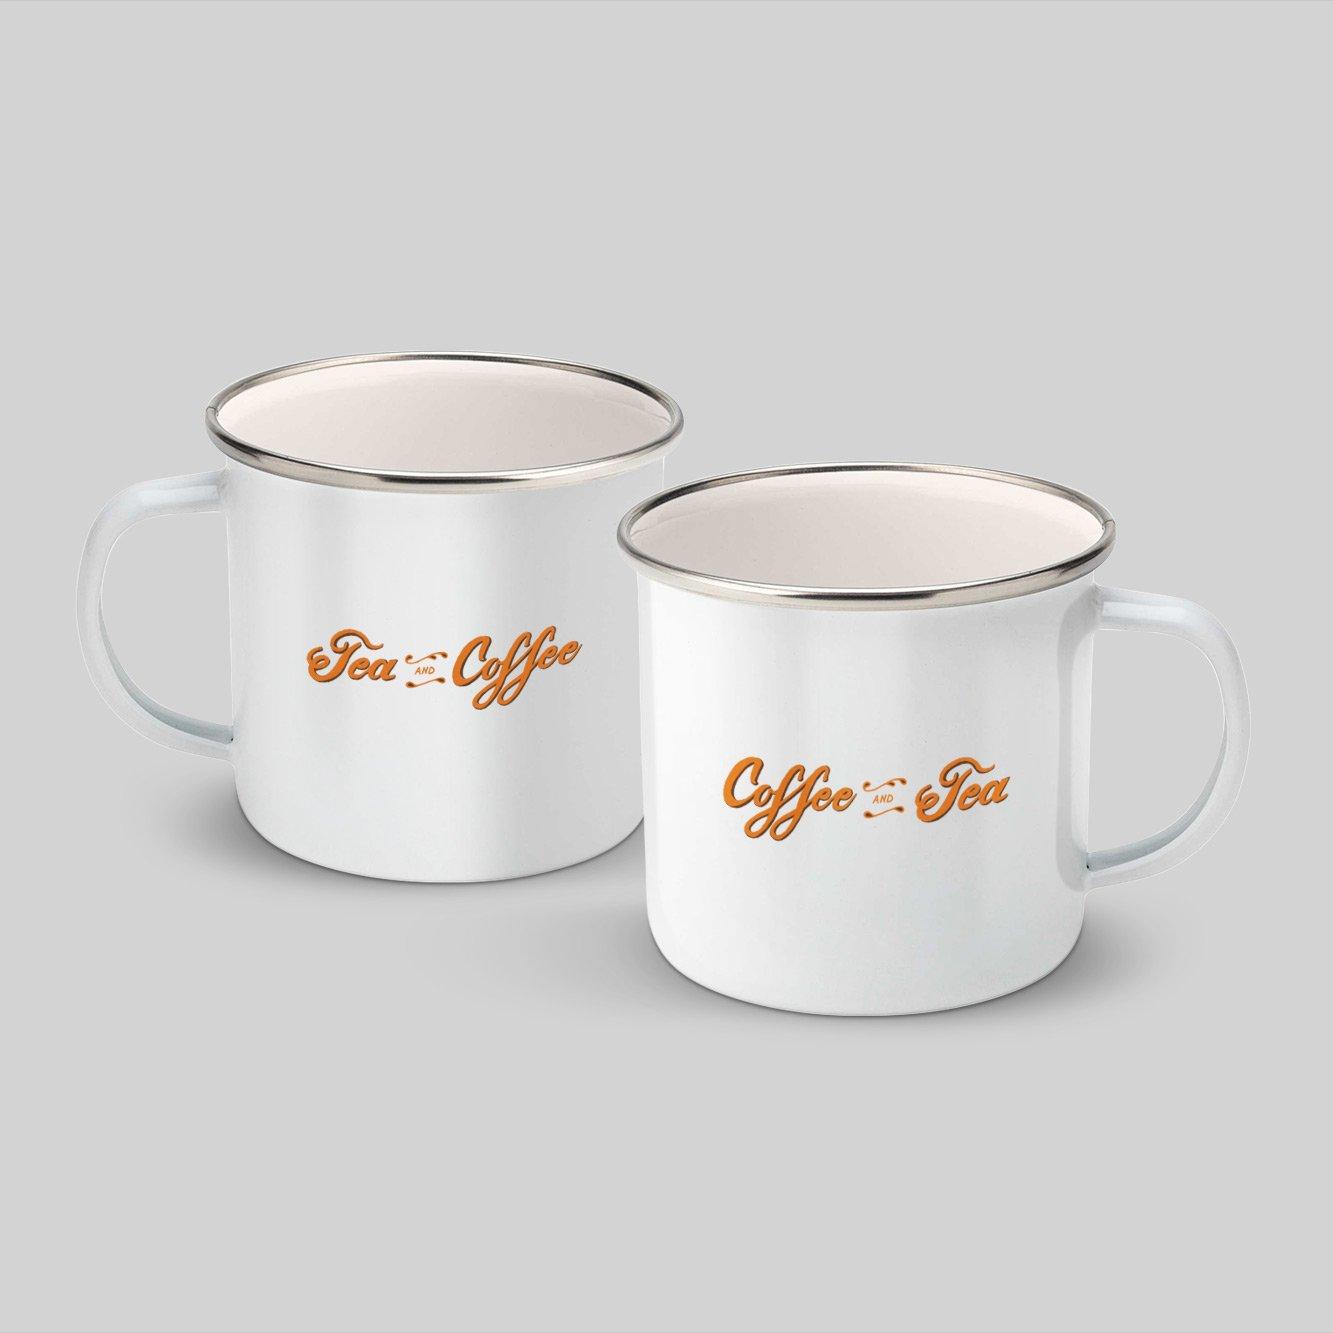 Image of Tea and Coffee Enamel Mug